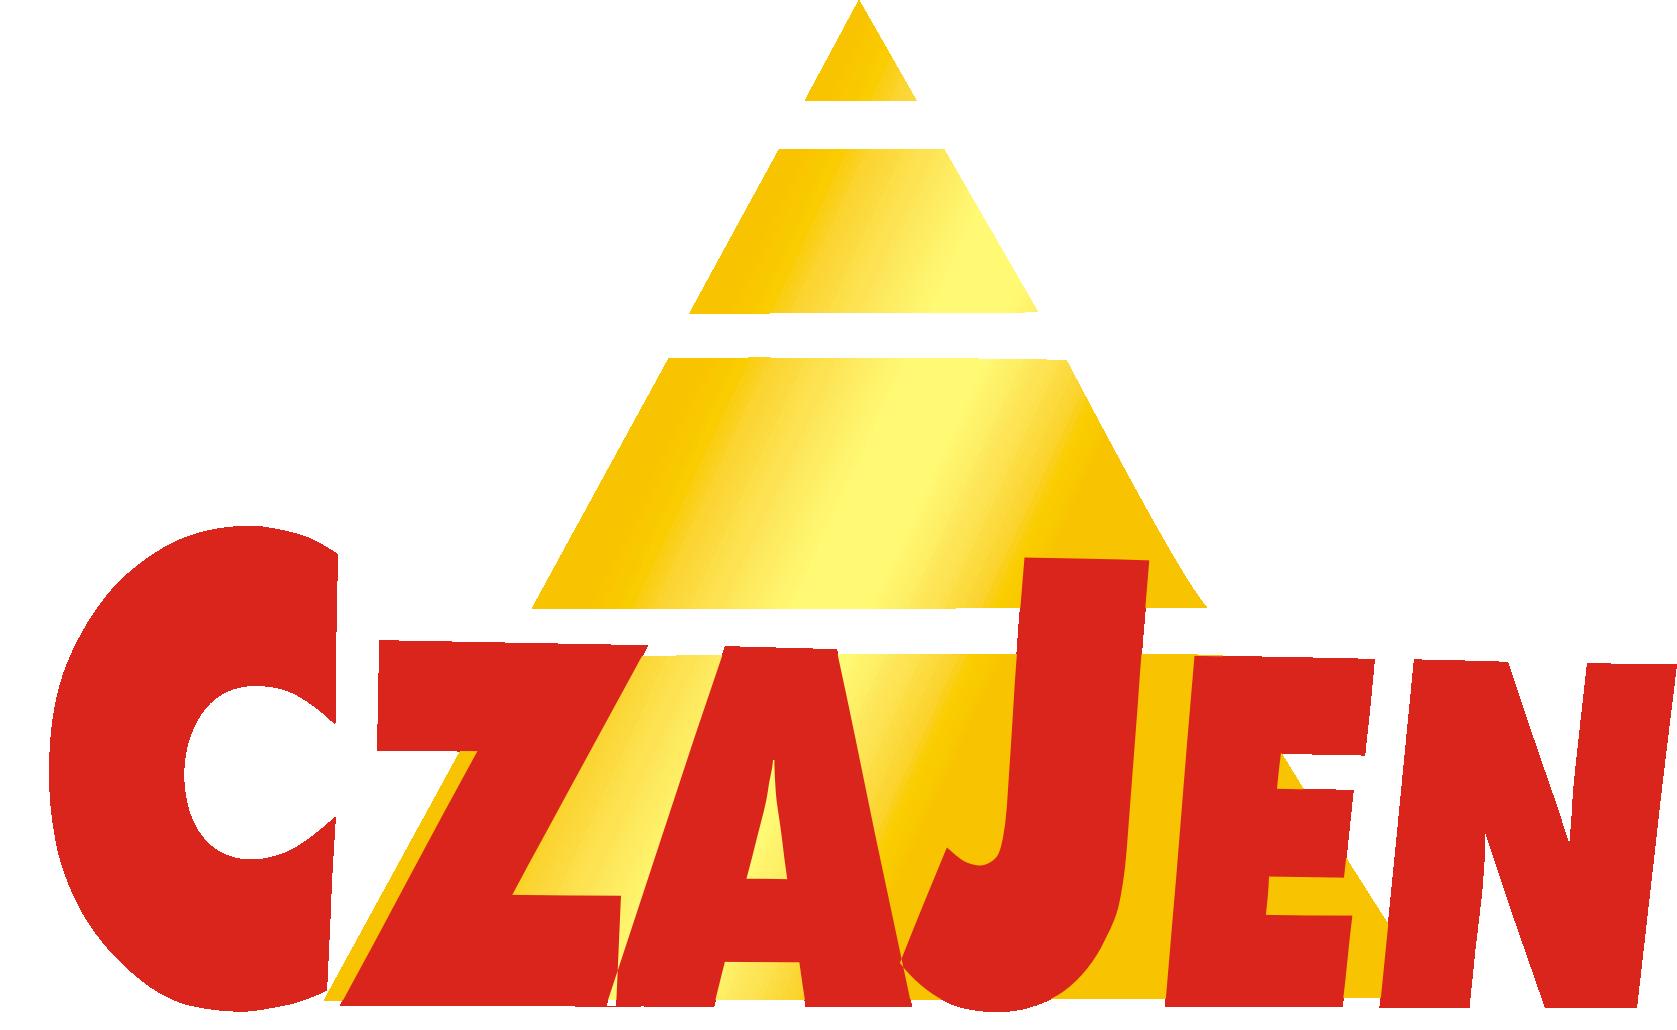 logo_czajen czyste